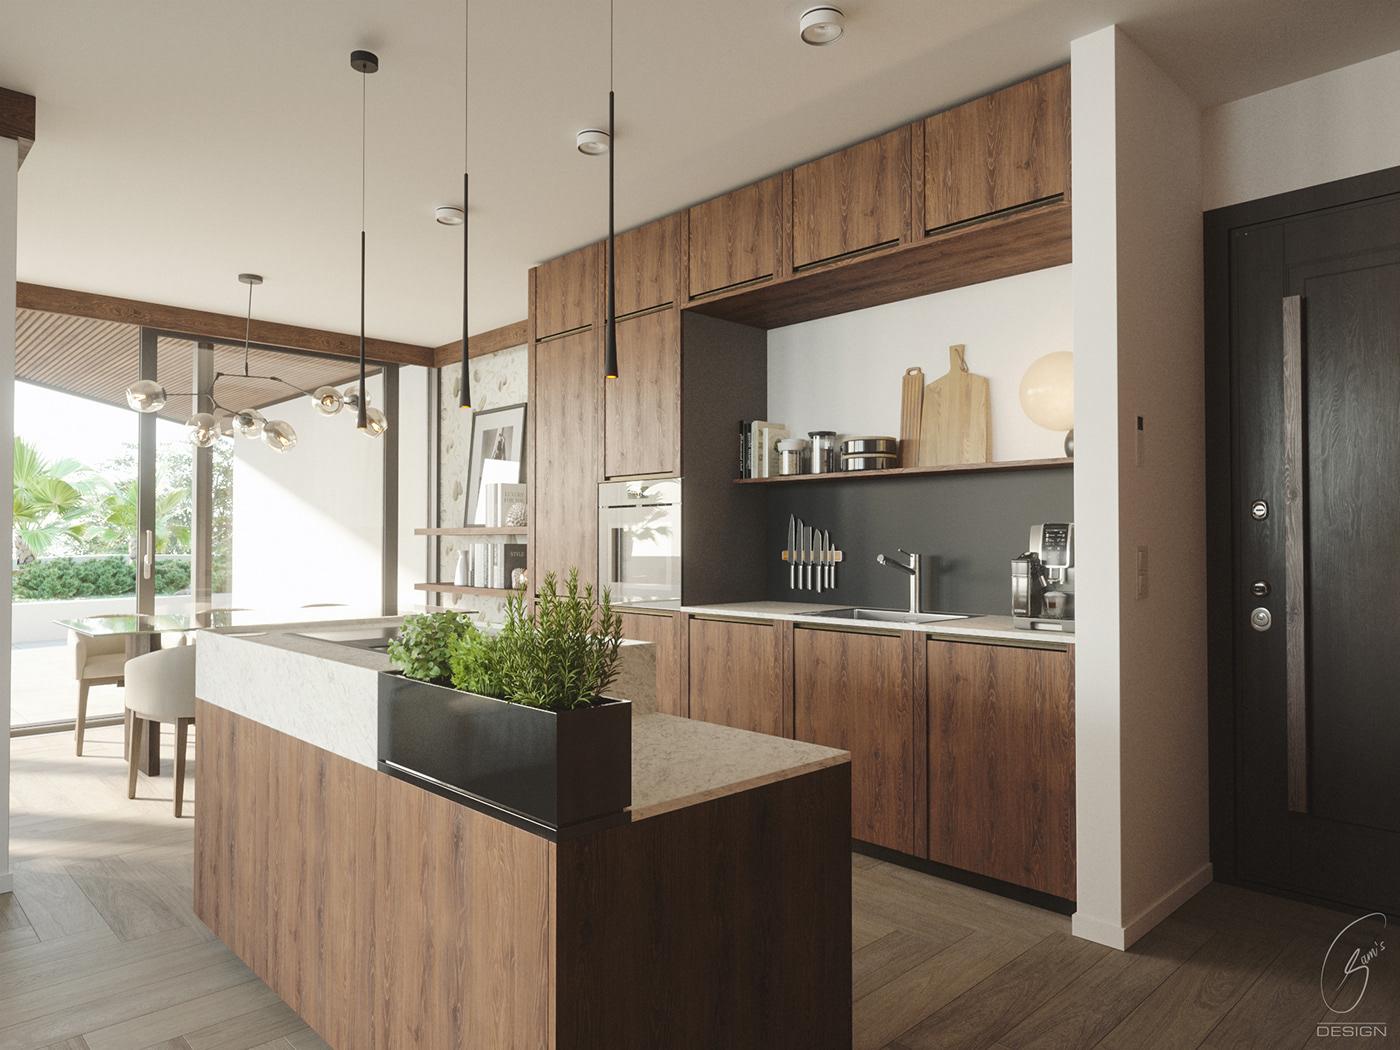 3dsmax archviz FStorm kitchen walnut